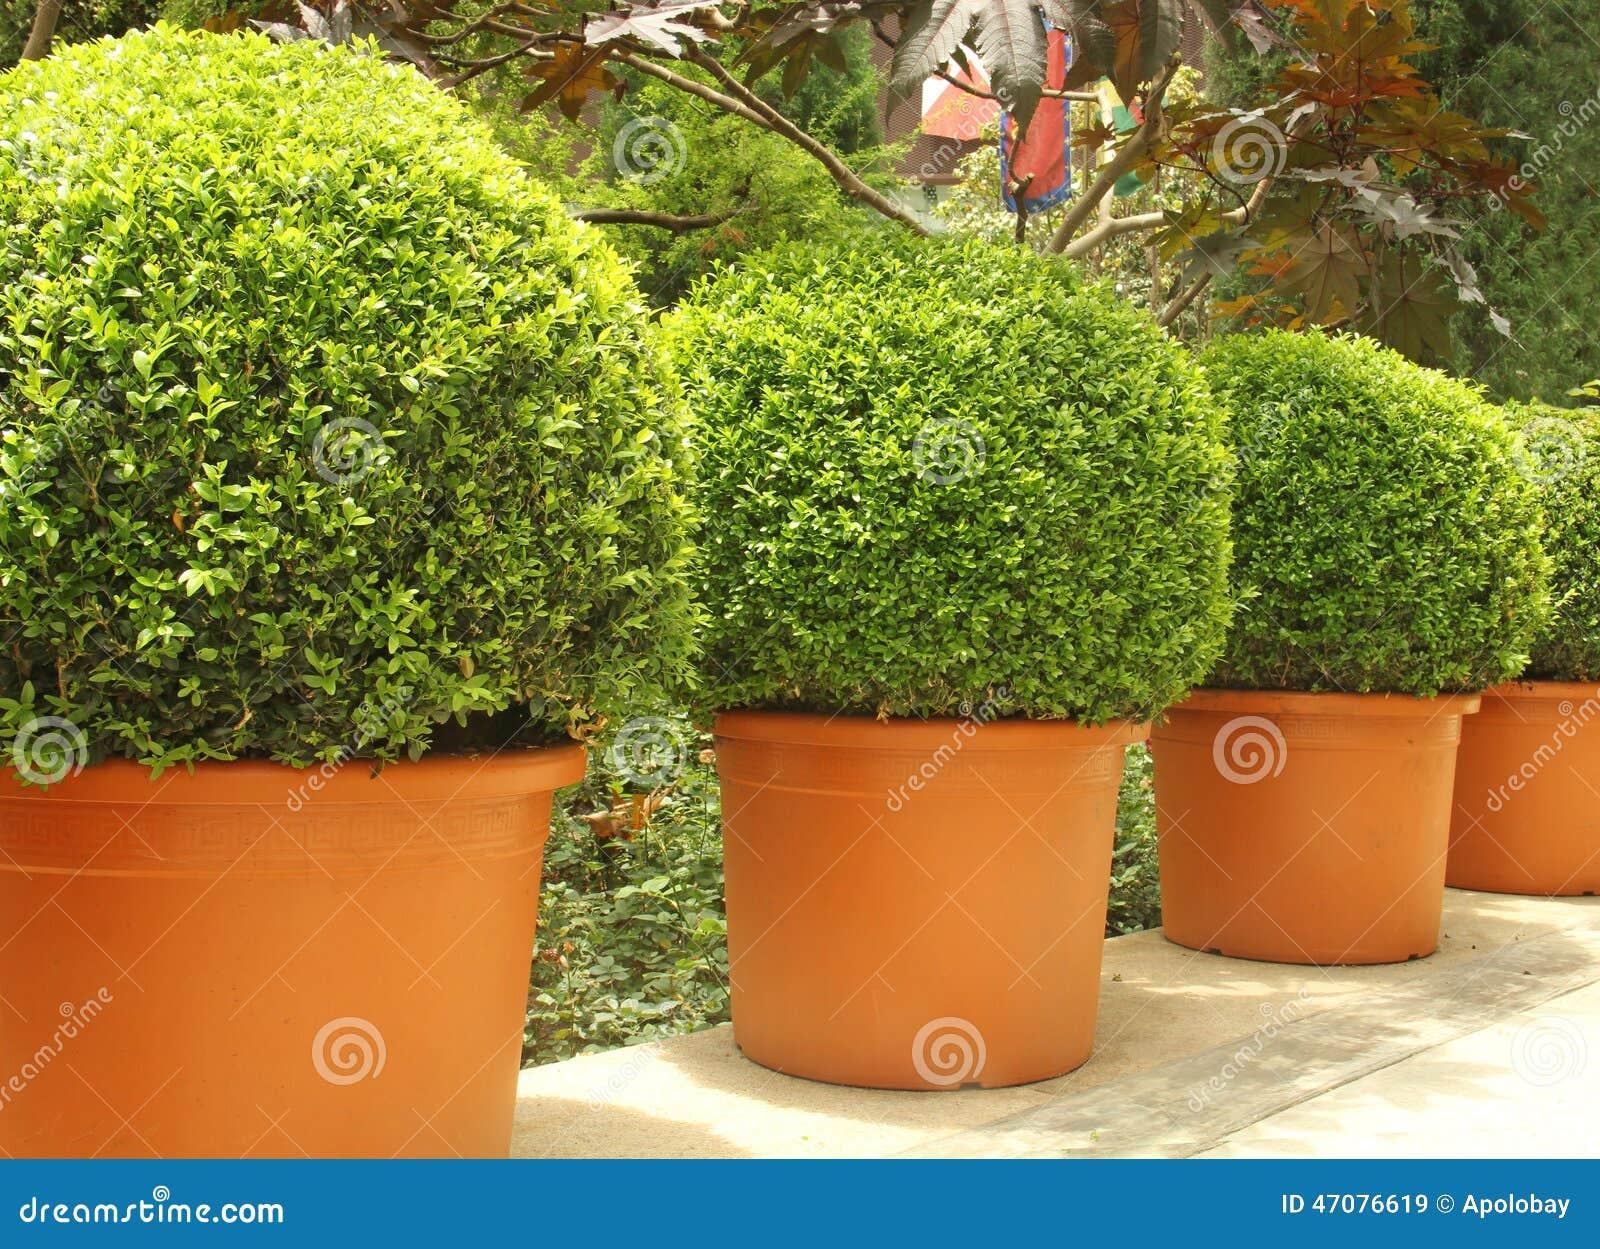 Kleine mooie bomen in potten stock foto afbeelding 47076619 What are miniature plants grown in pots called